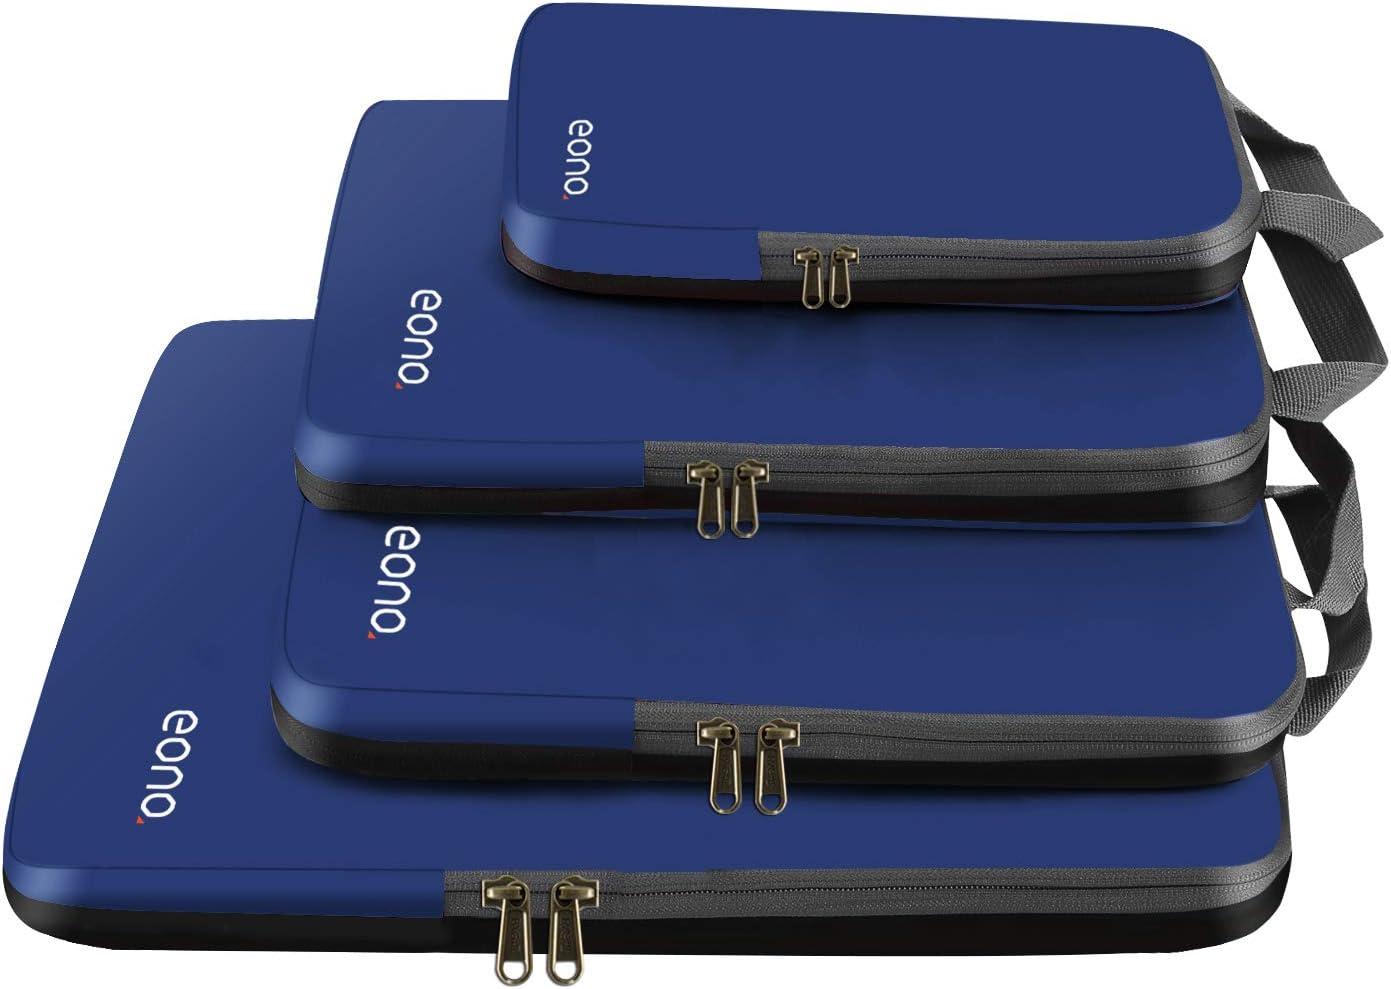 Eono by Amazon - Organizadores de Viaje de compresión expandibles, Impermeable Organizador para Maletas, Organizador de Equipaje, Cubos de Embalaje, Compression Packing Cubes, Navy, 4 Set